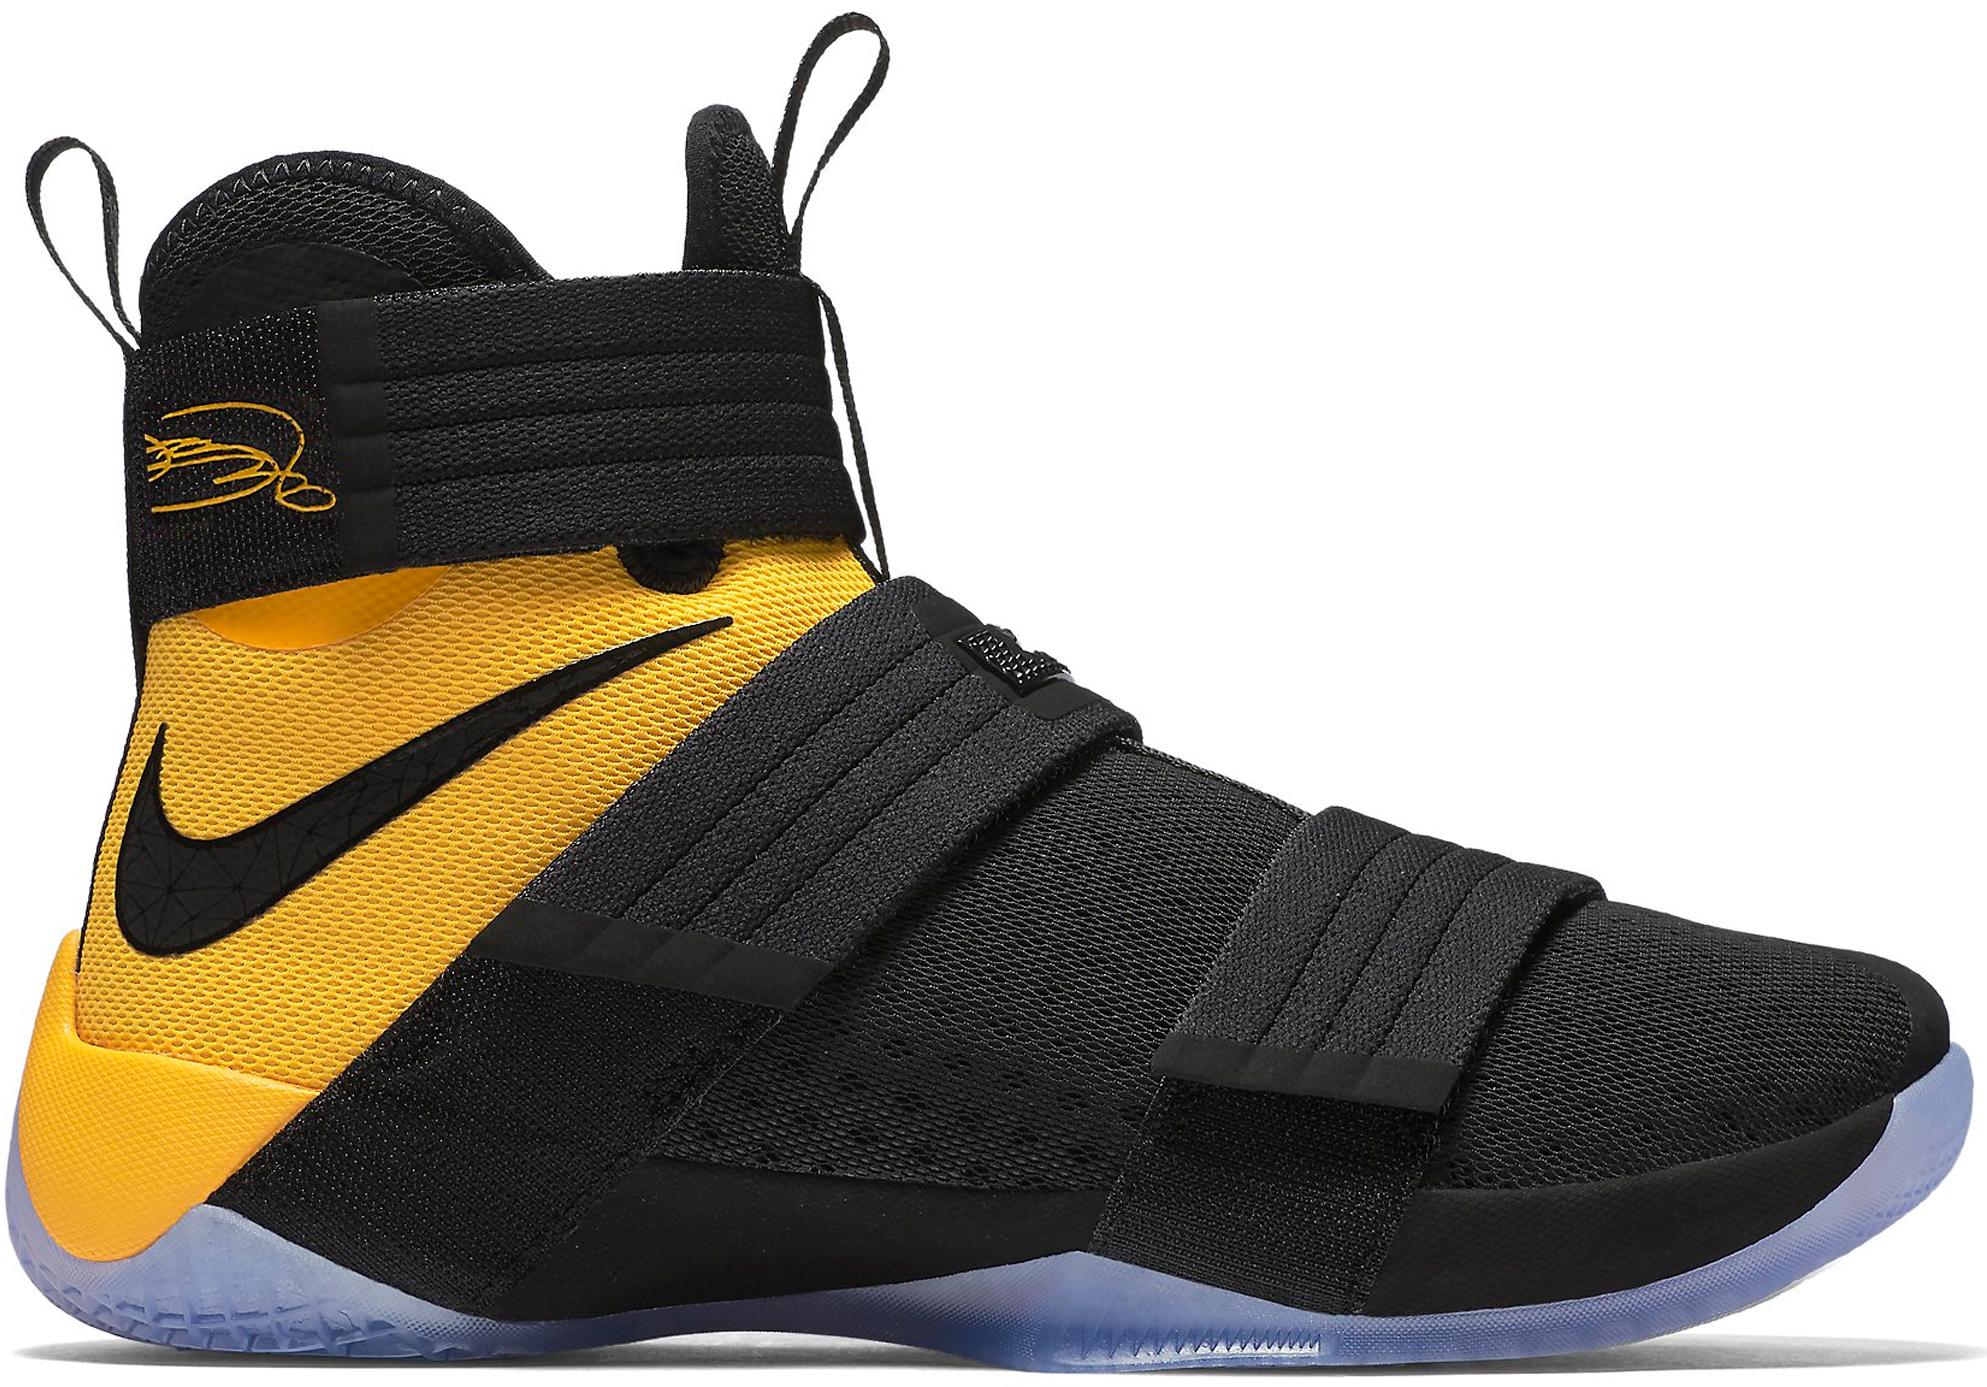 Nike LeBron Zoom Soldier 10 Black Uni